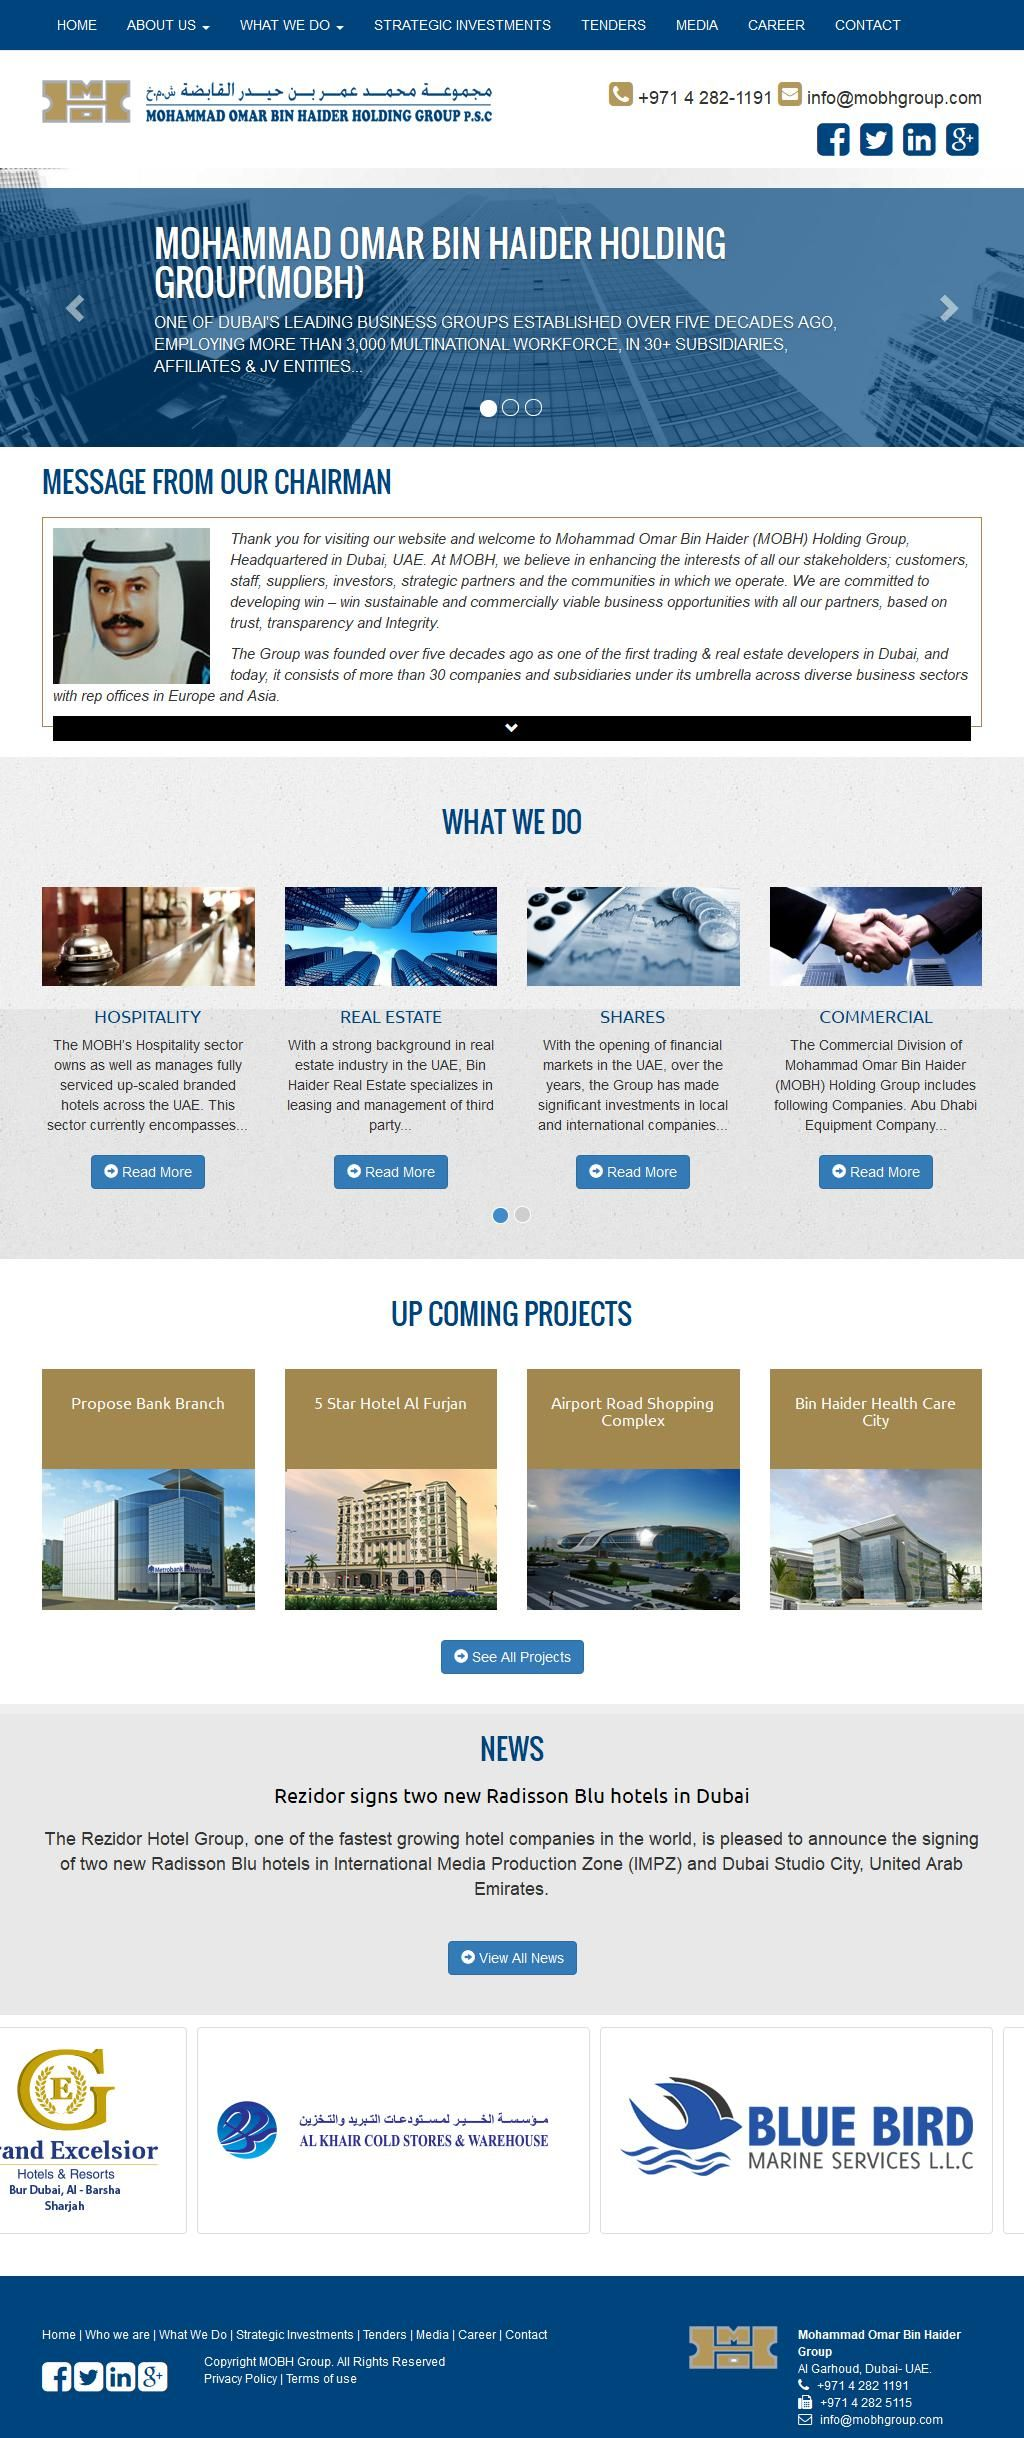 Pin by HaiUAE com on Dubai Local Business | Pinterest